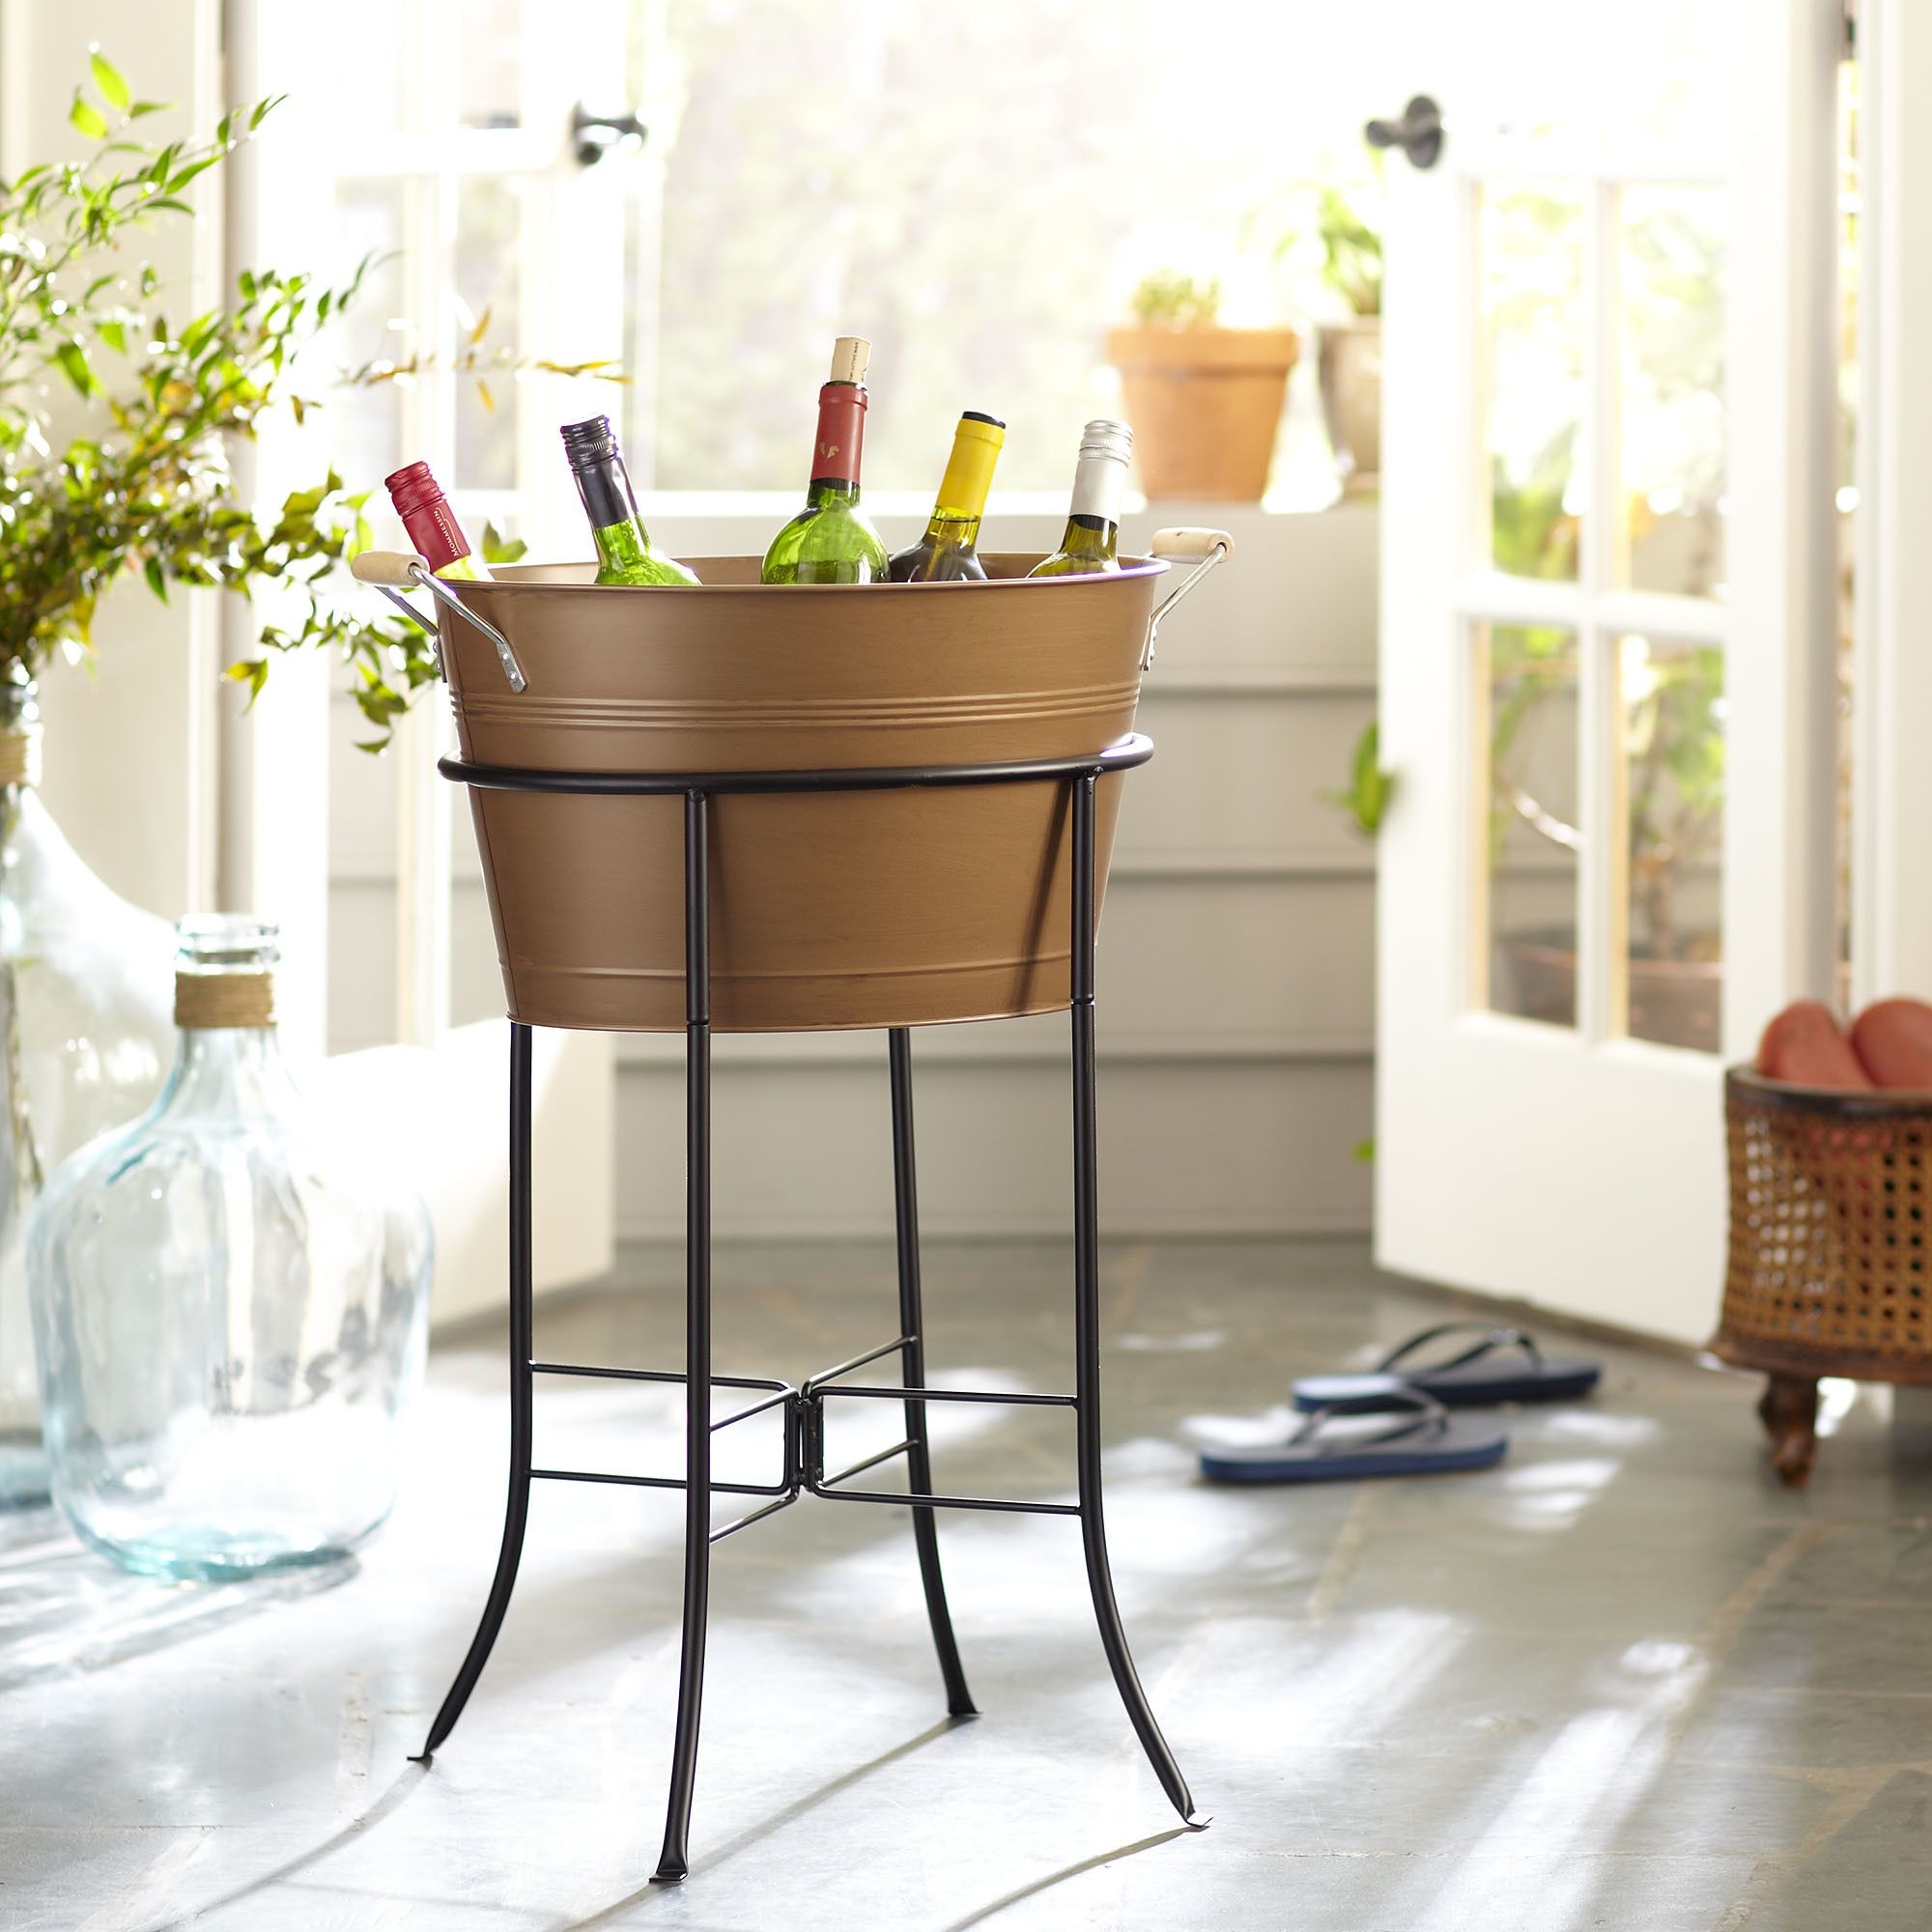 Galvanized Beverage Tub With Stand Copper Galvanized Beverage Tub Beverage Tub Party Tub